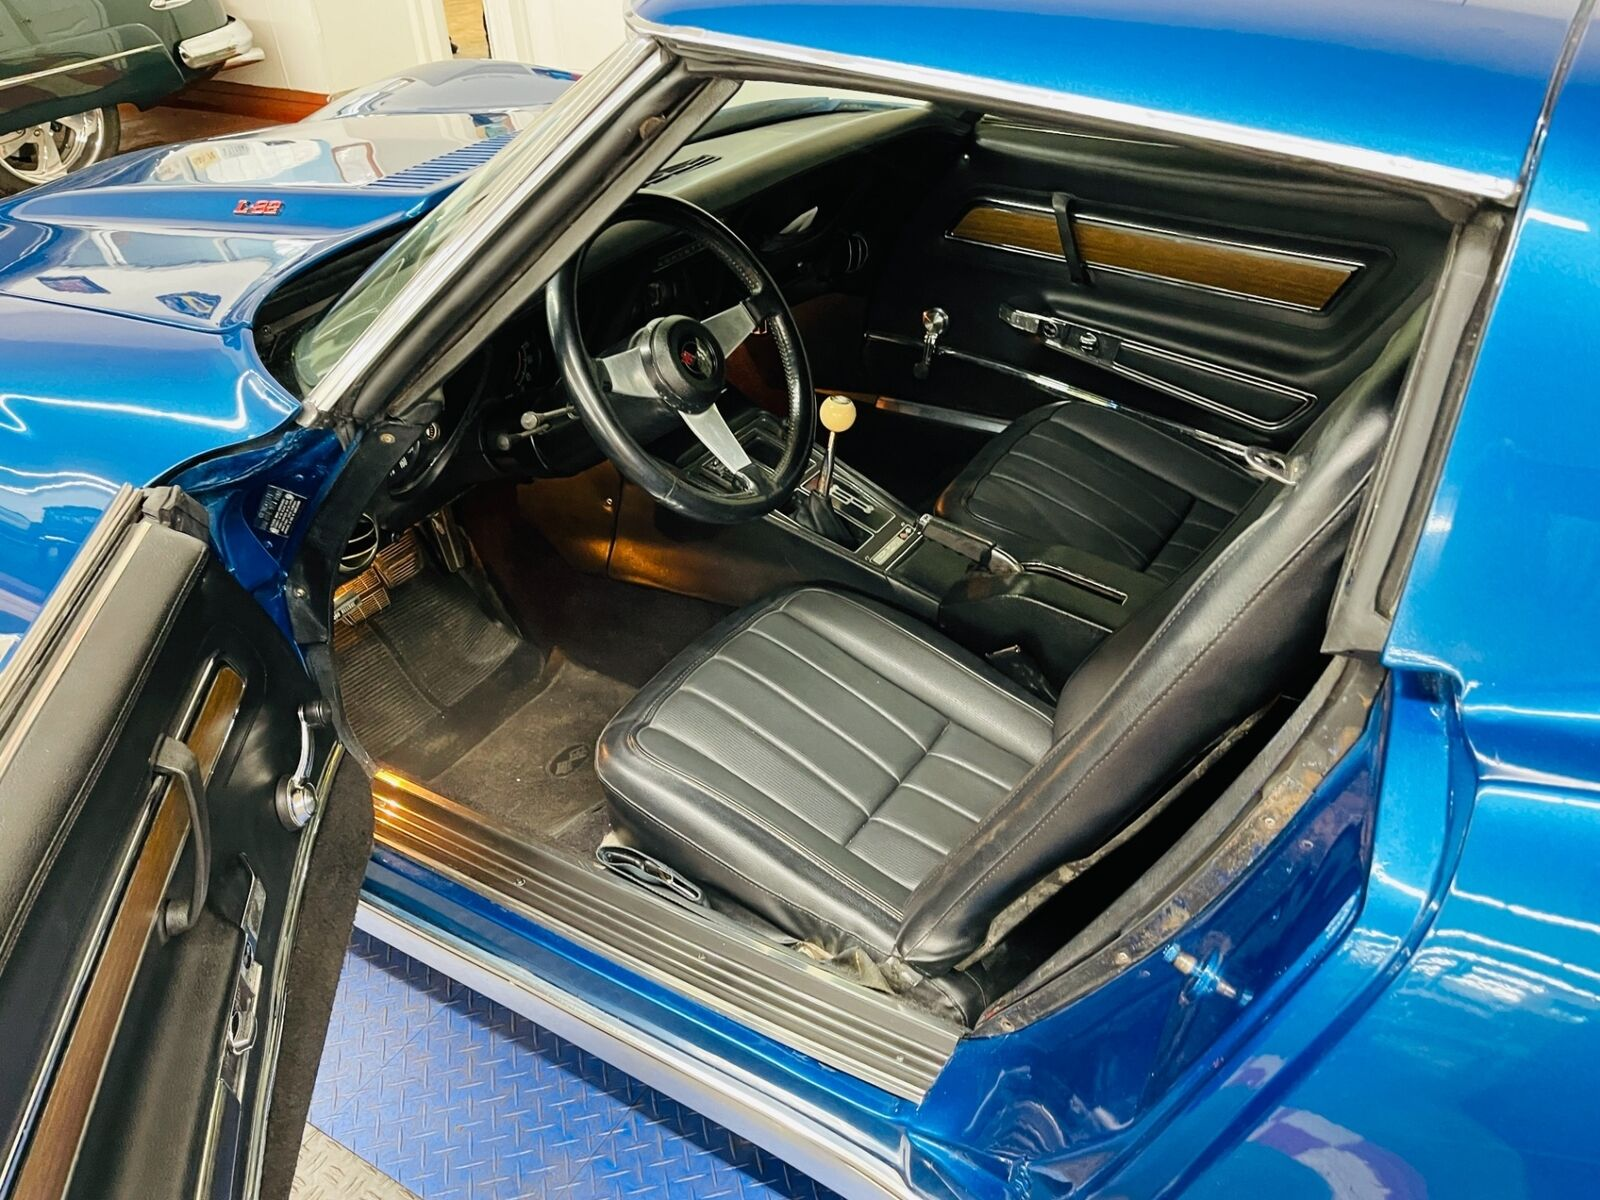 1973 Blue Chevrolet Corvette Coupe  | C3 Corvette Photo 8